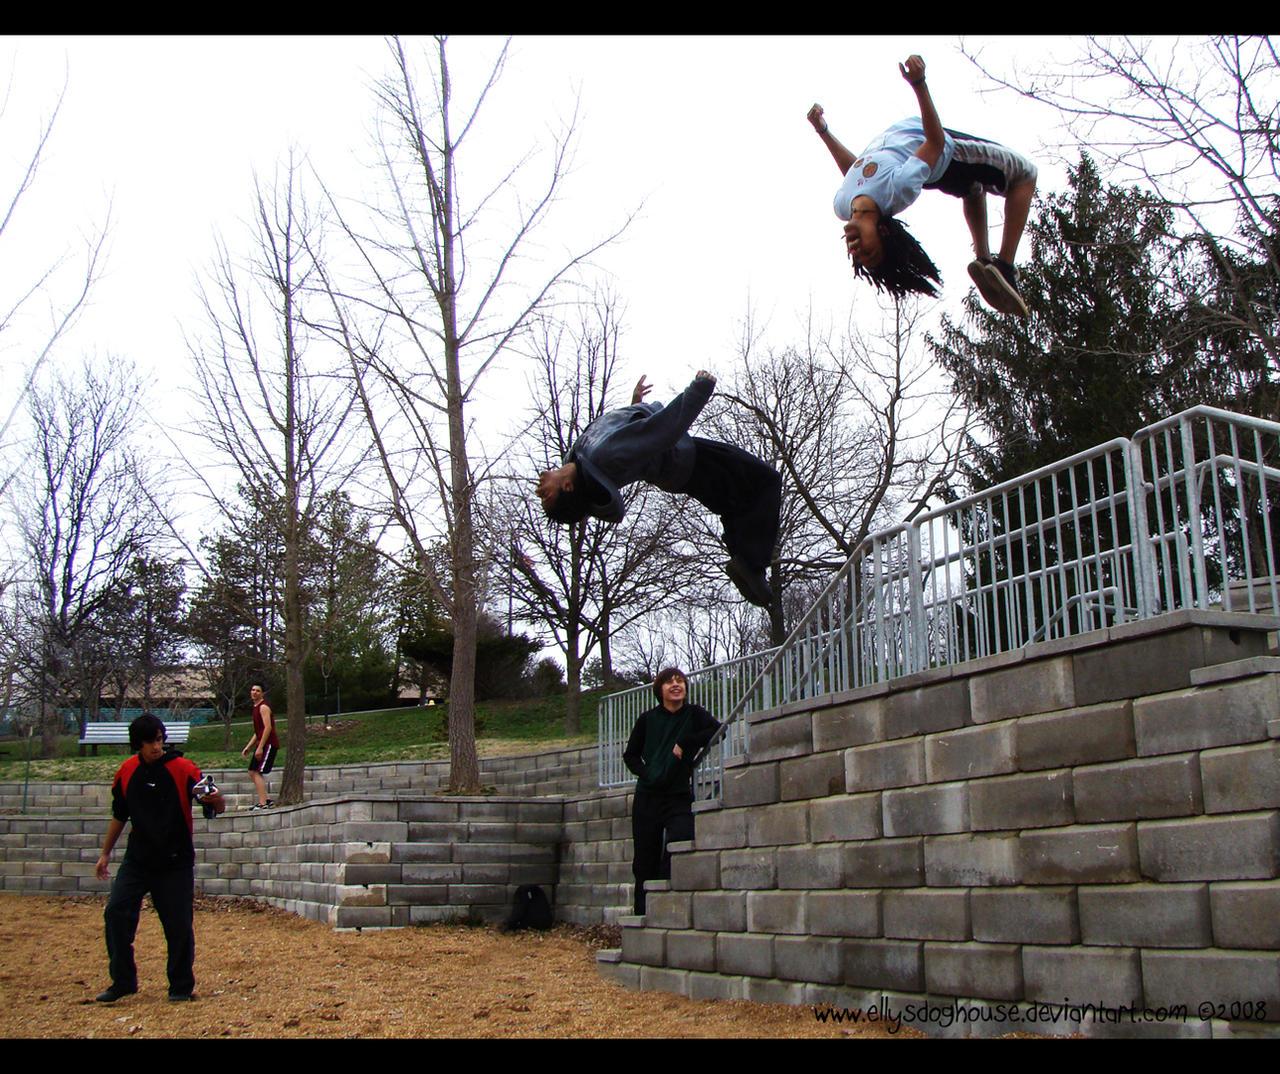 TRICKset's Day at the Park by ellysdoghouse